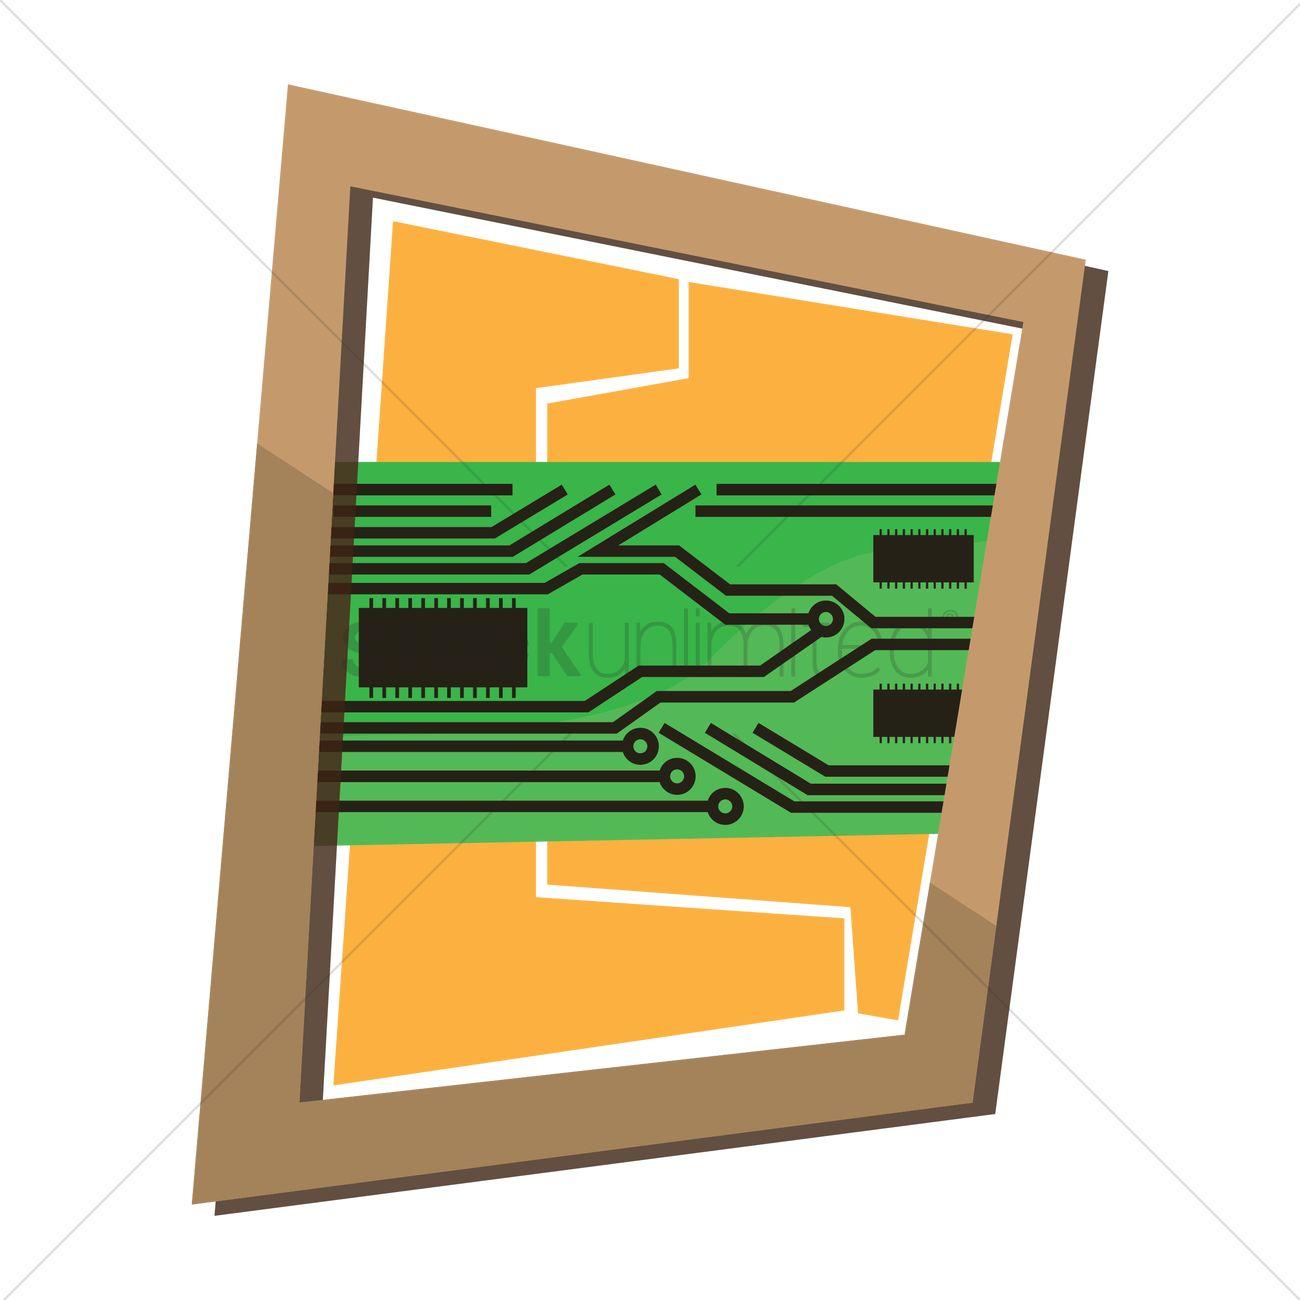 Circuit board wall frame Vector Image.